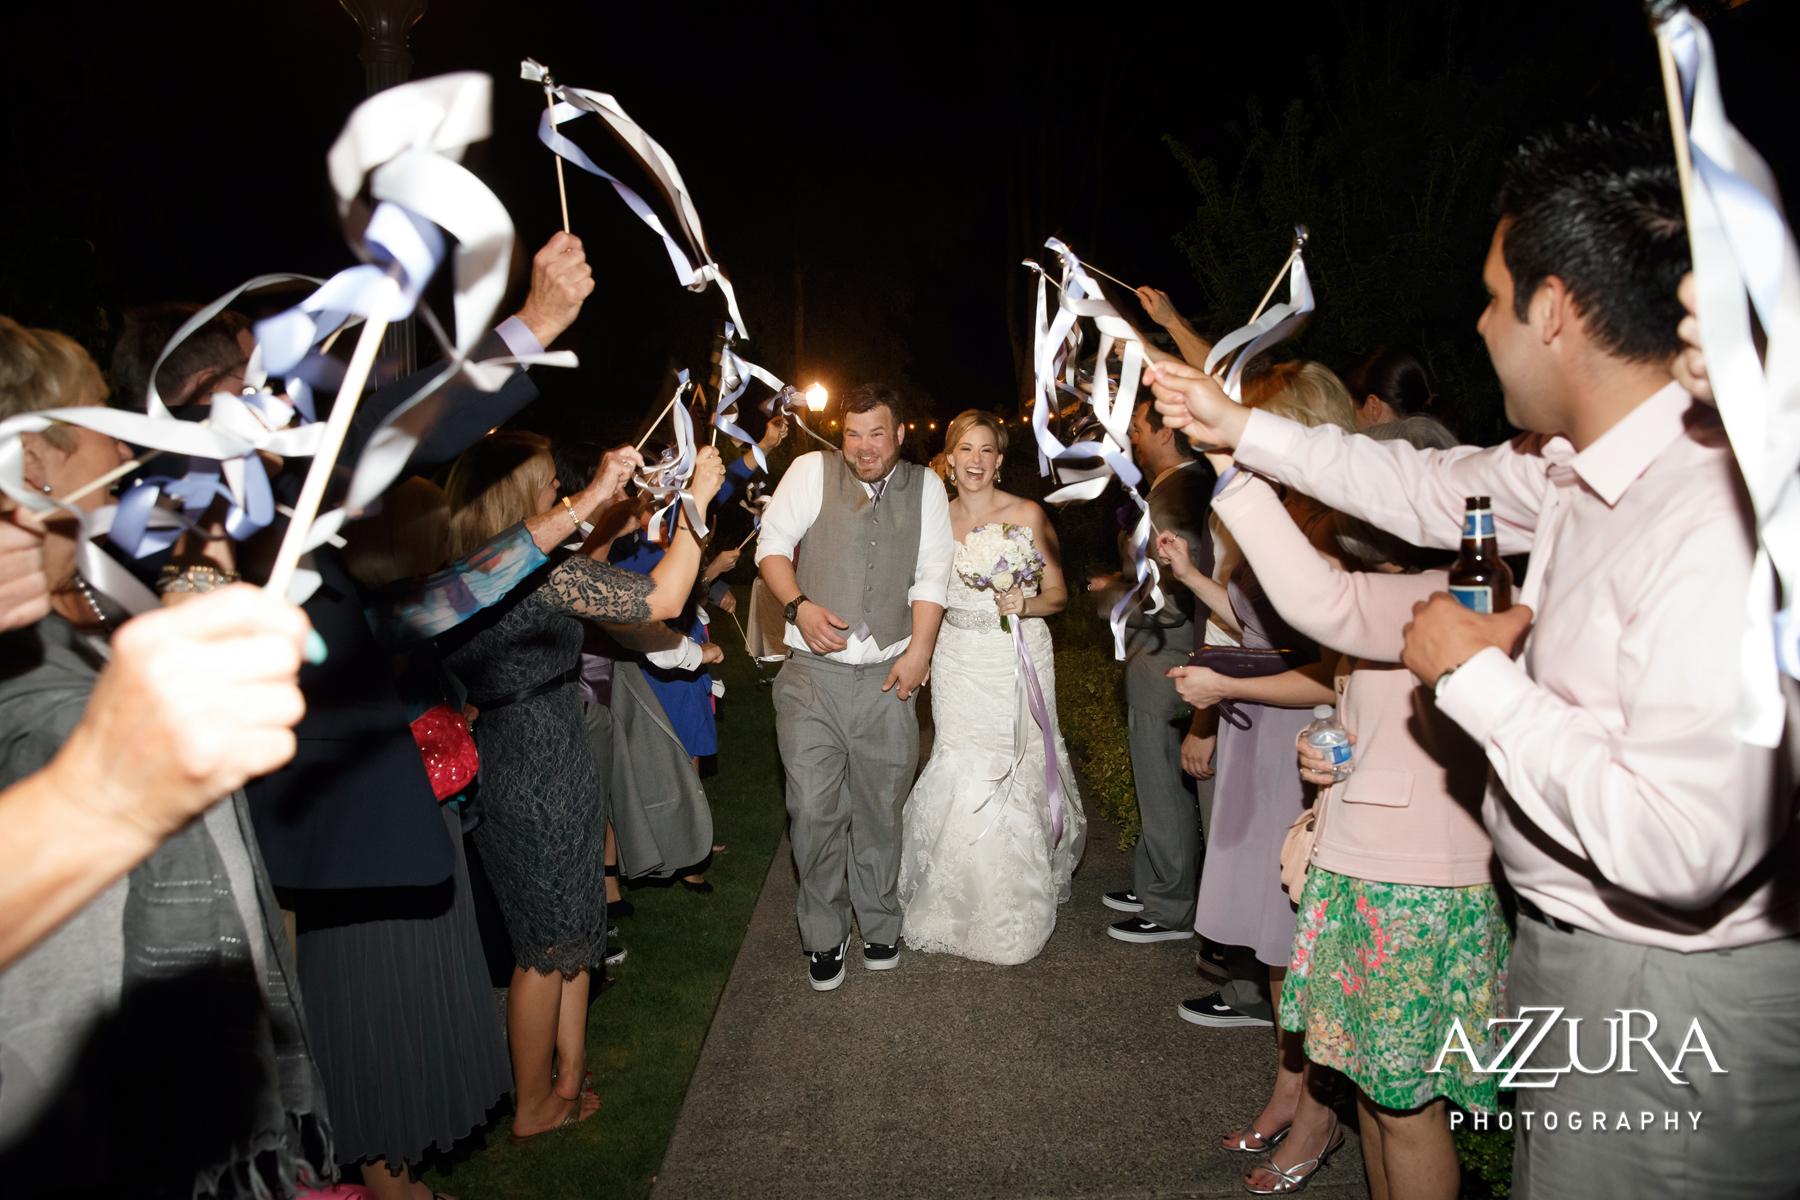 Laurel Creek Manor Wedding in Seattle | Ribbon send-off from wedding reception | Perfectly Posh Events, Seattle Wedding Planner | Azzura Photography